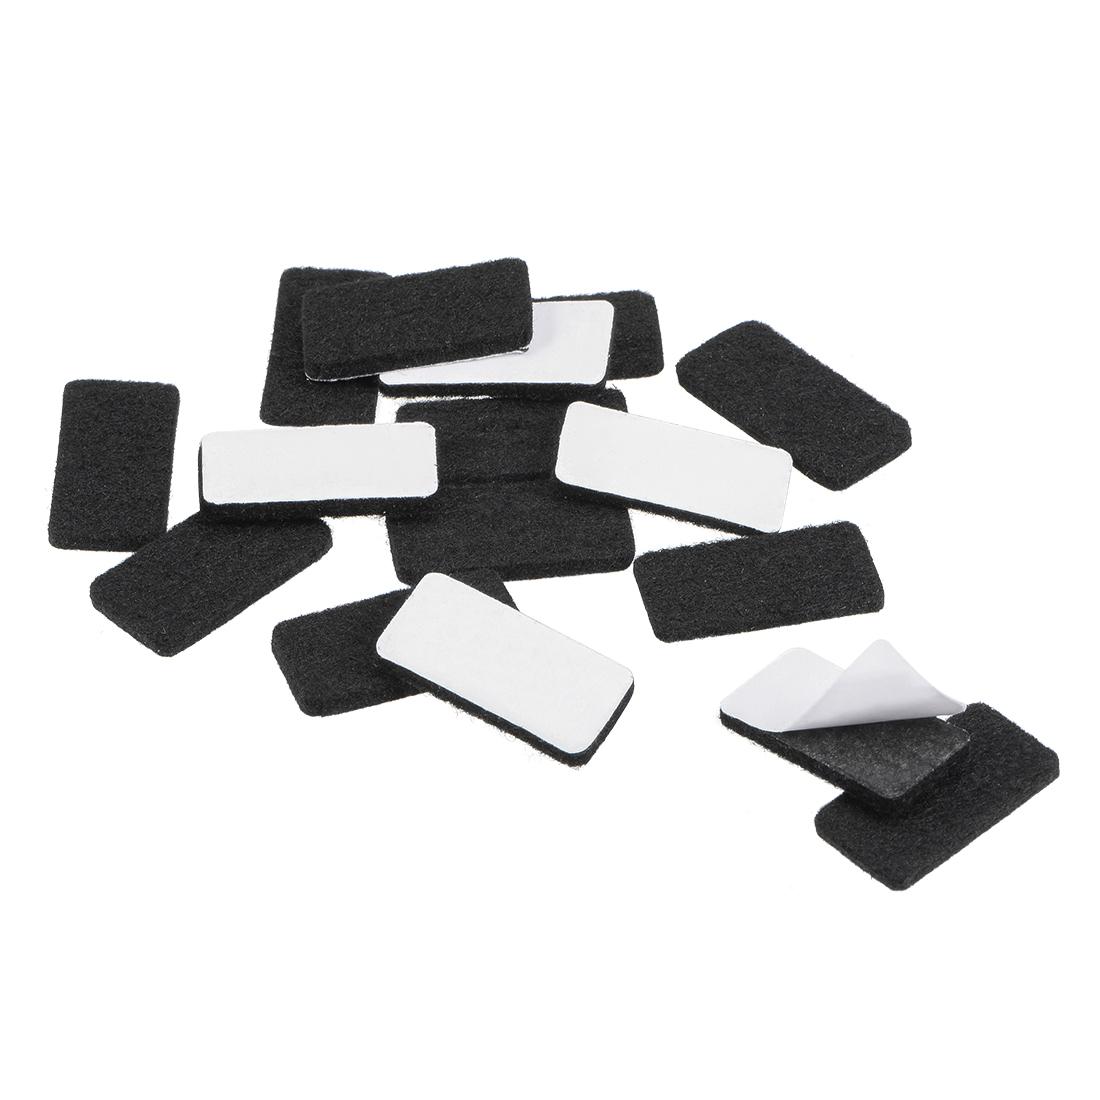 Furniture Pads 30mm x 15mm Adhesive Felt Pads 3mm Thick Black 48Pcs